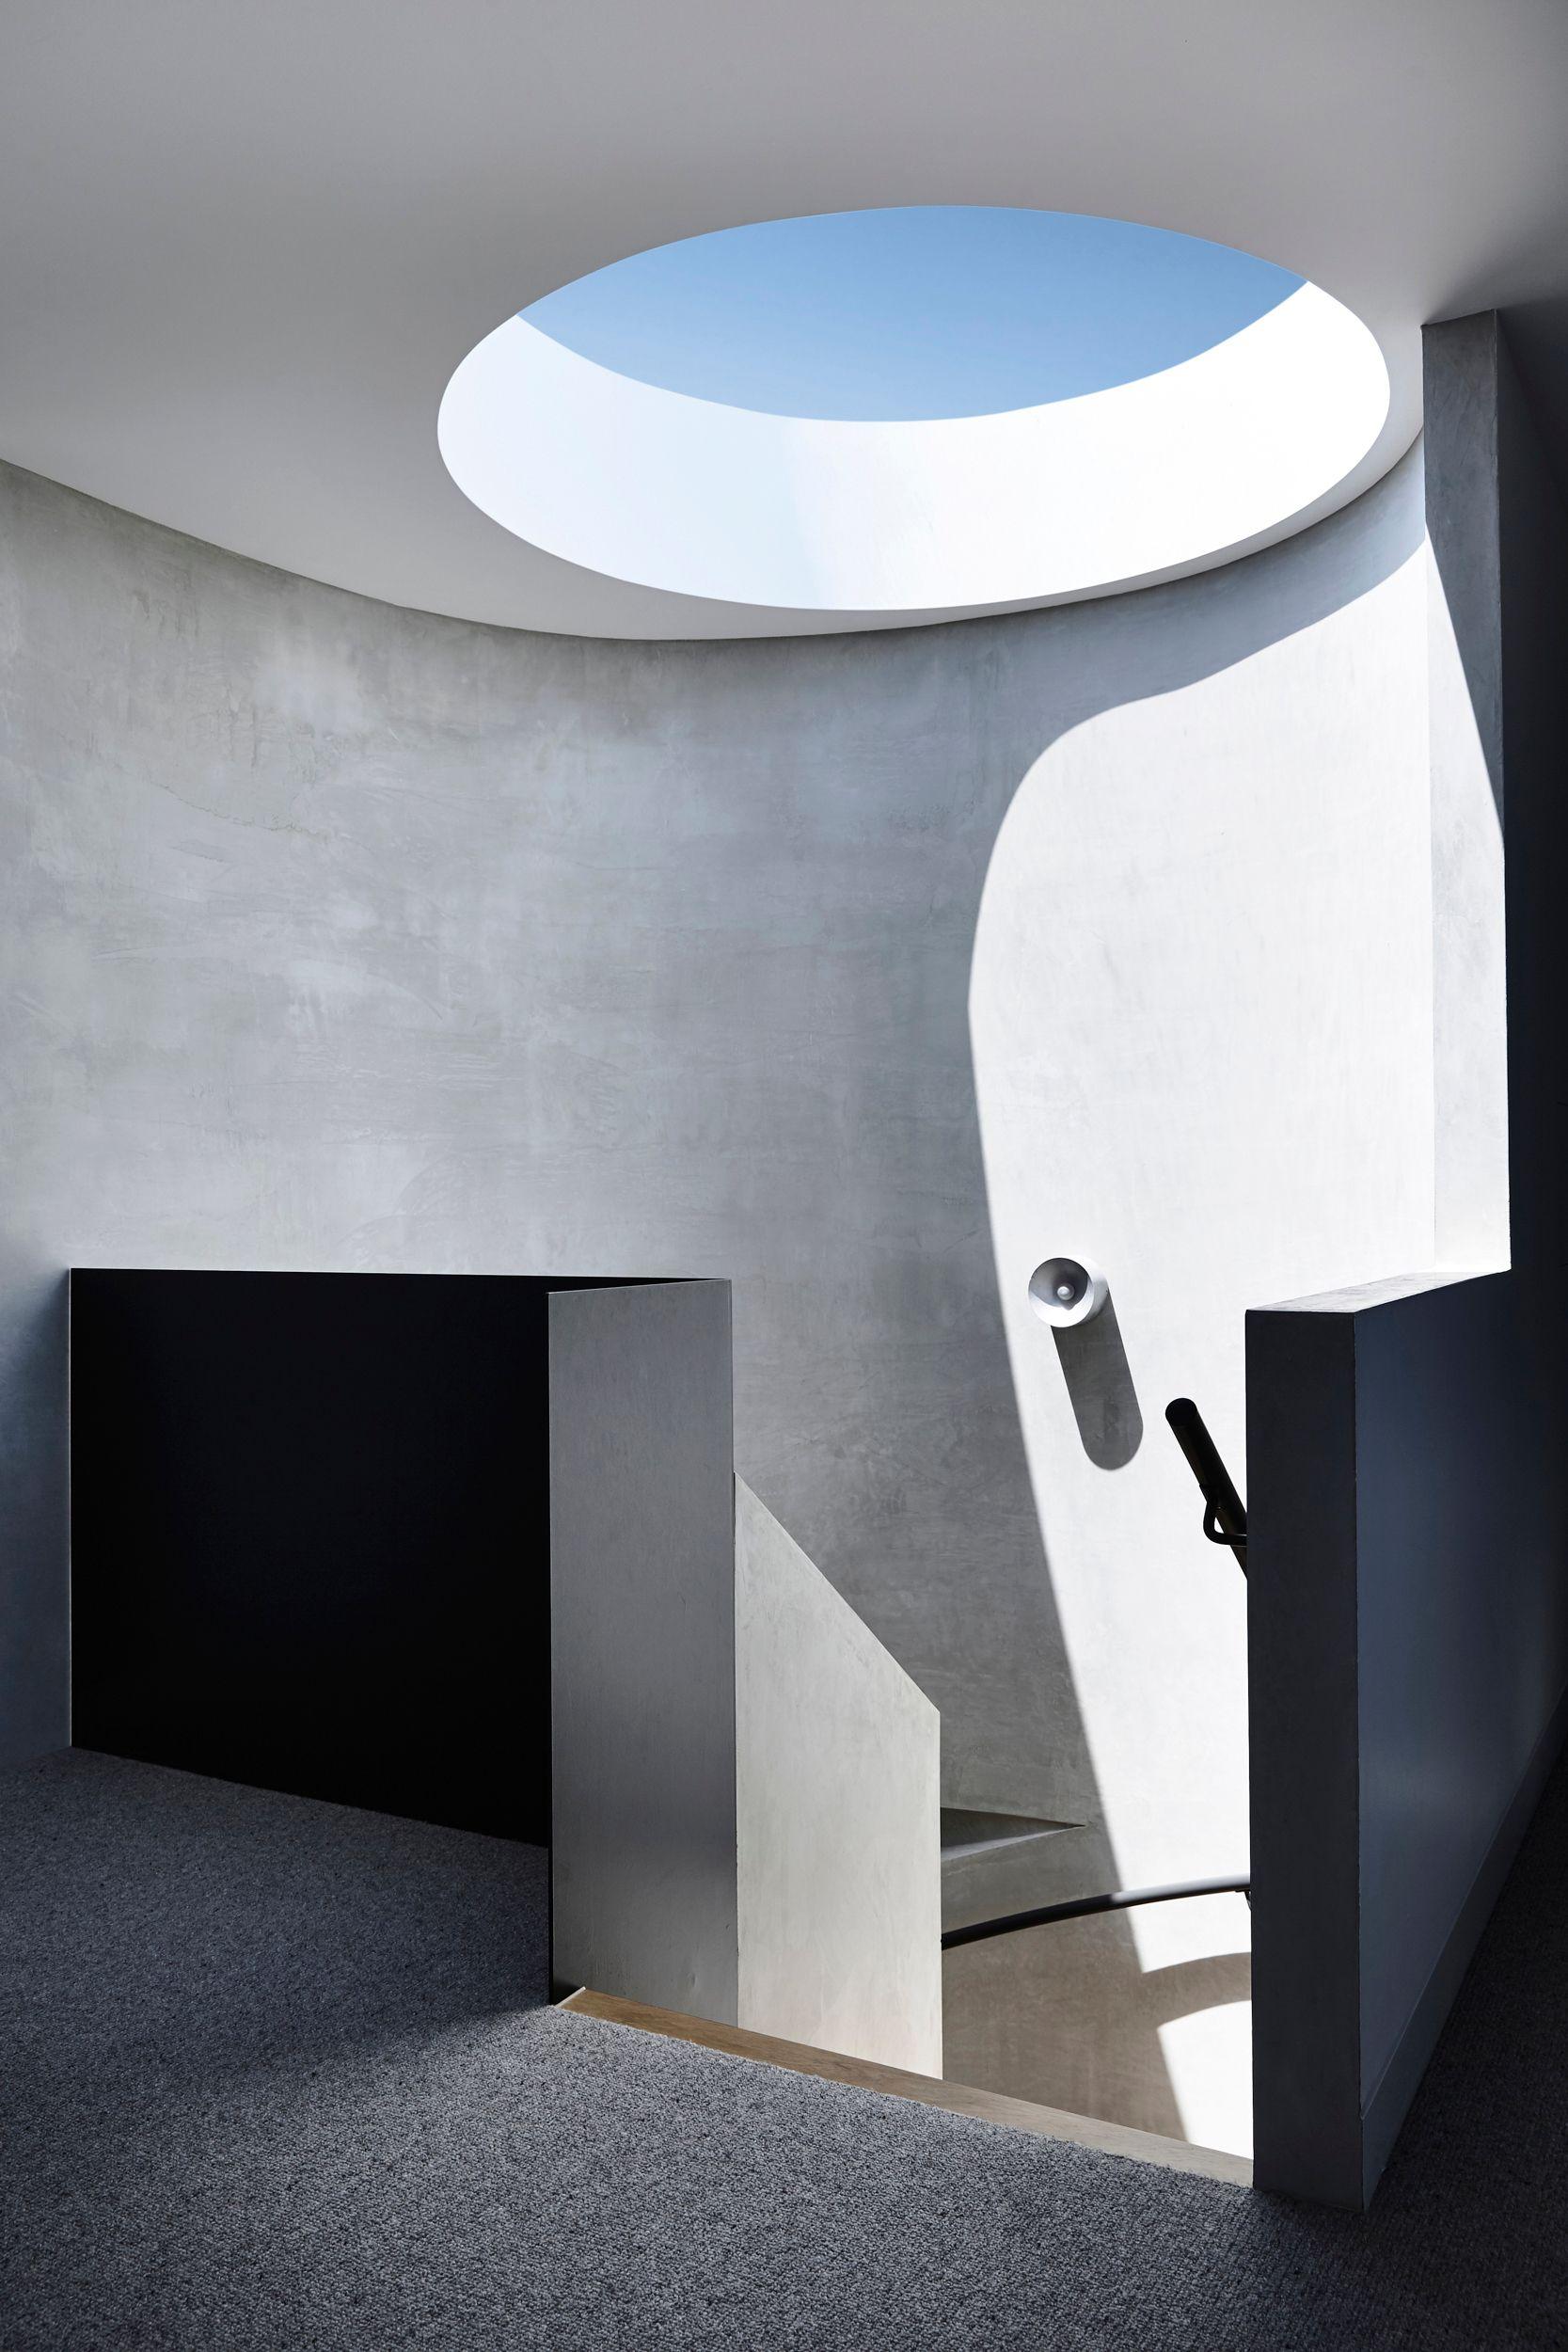 Concrete Rendered Interior Walls In 2020 Interior Architecture Design Interior Architecture Skylight Design